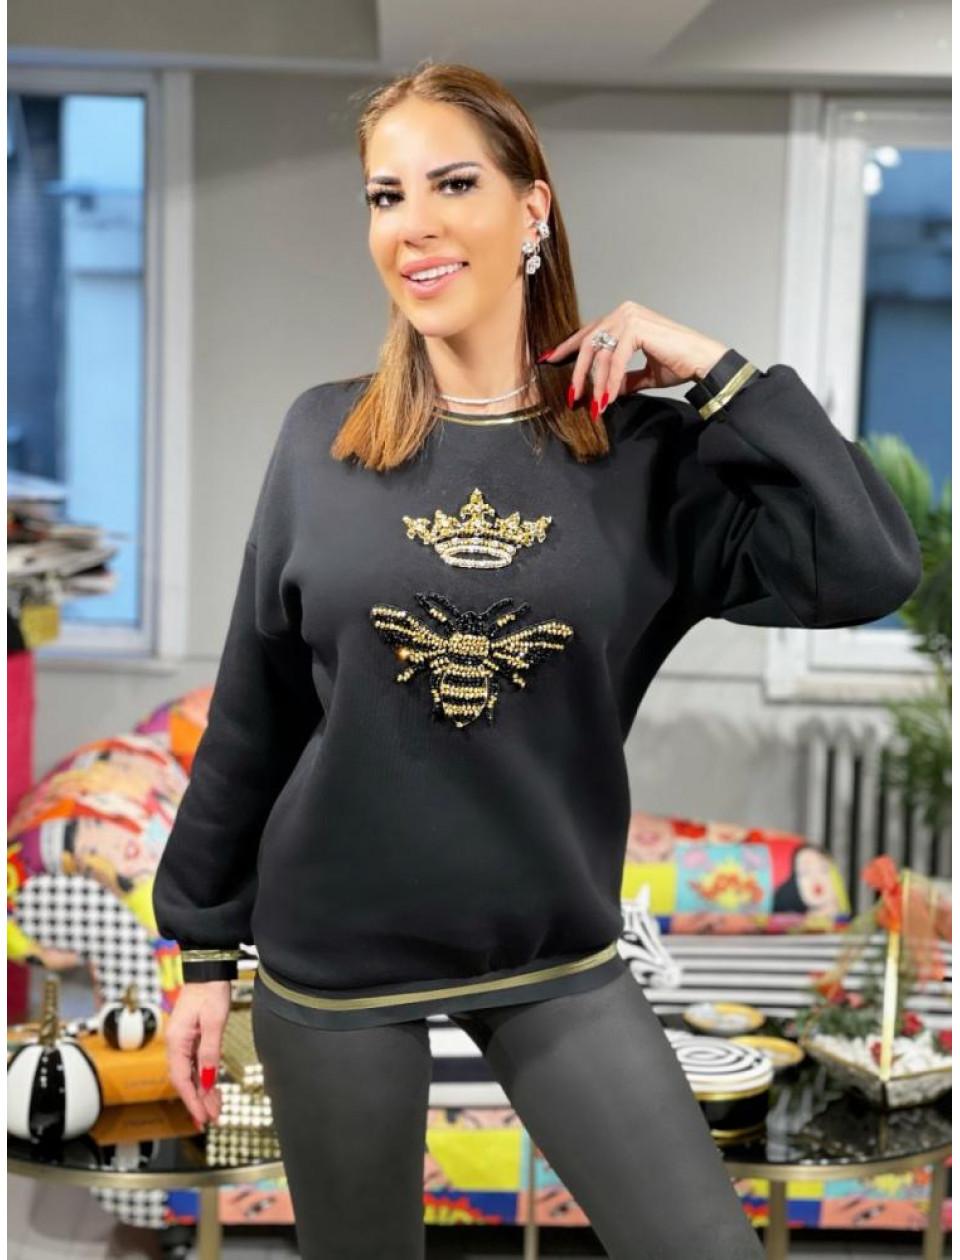 Bee Sb Sweatshirt